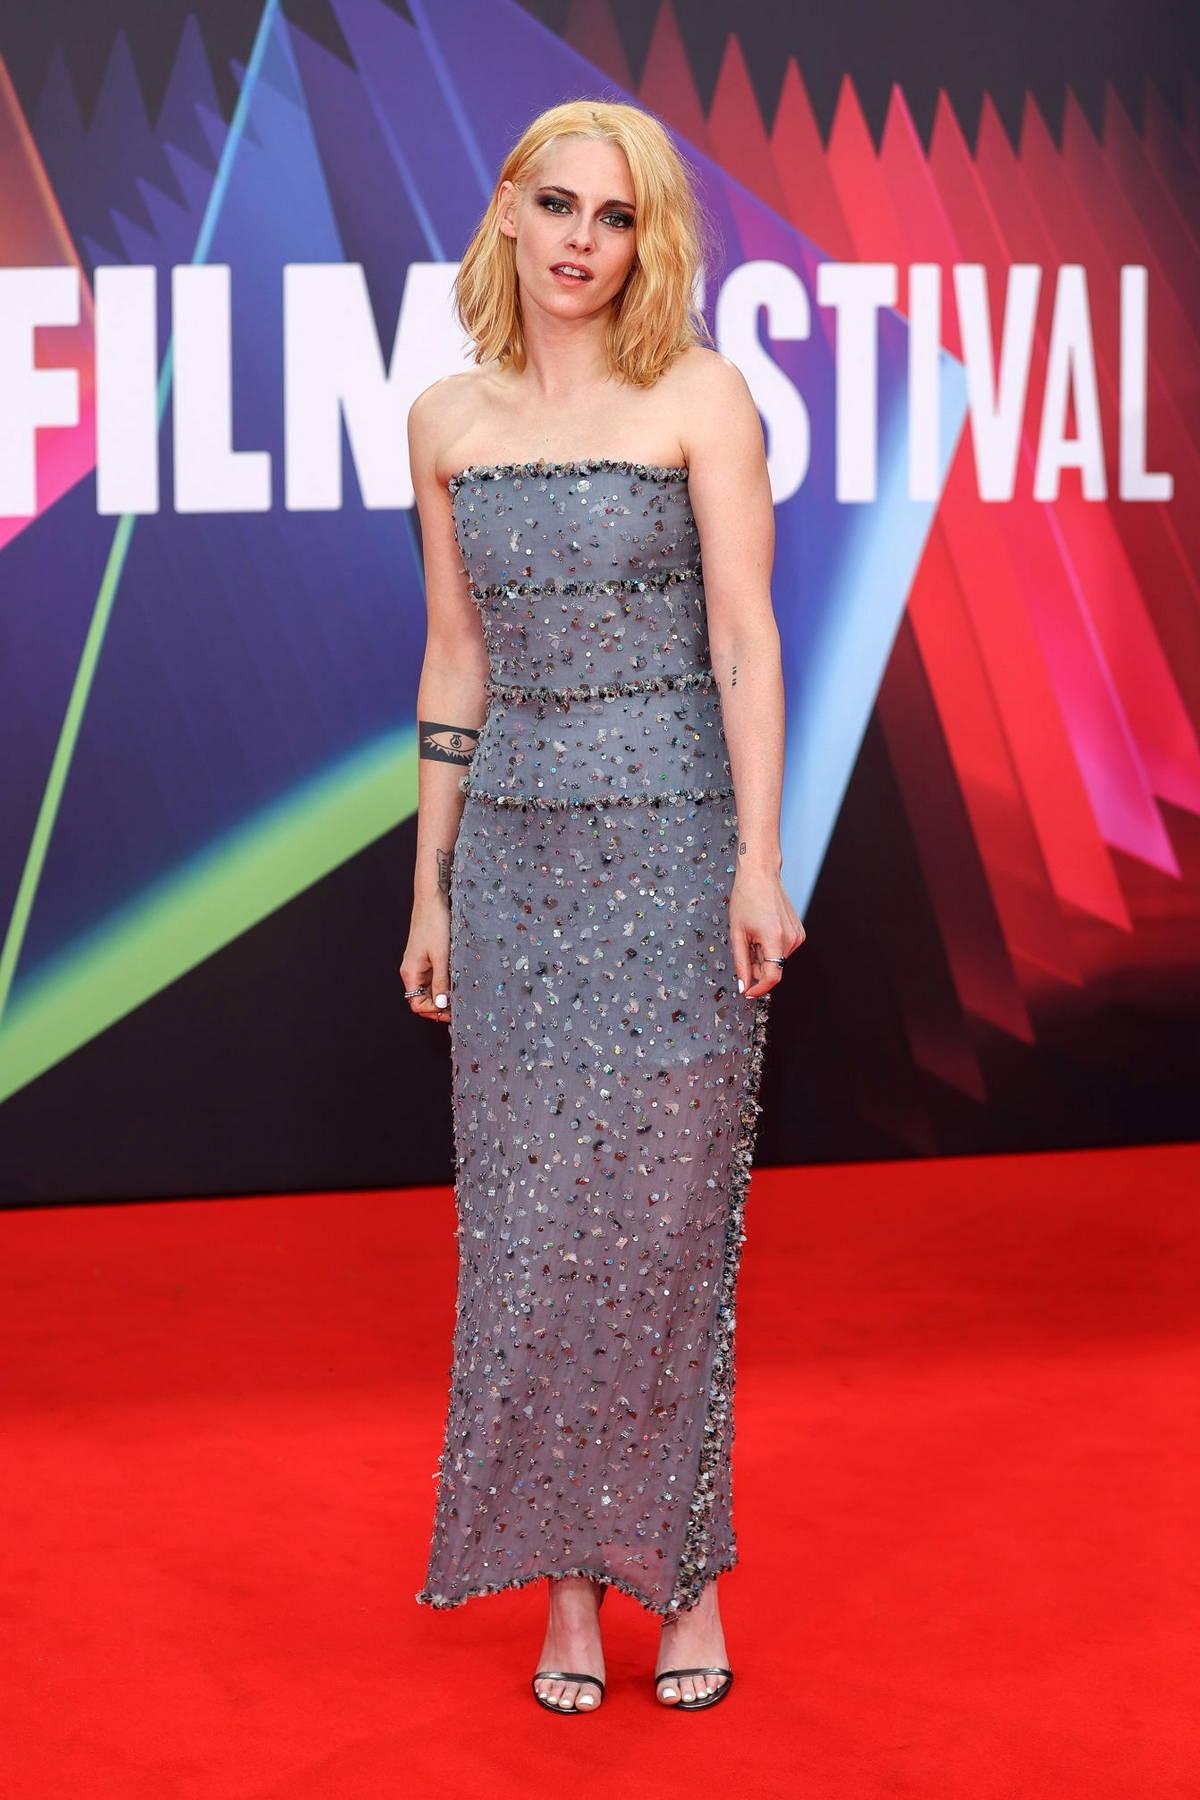 Kristen Stewart attends the UK Premiere of 'Spencer' during the 65th BFI London Film Festival in London, UK